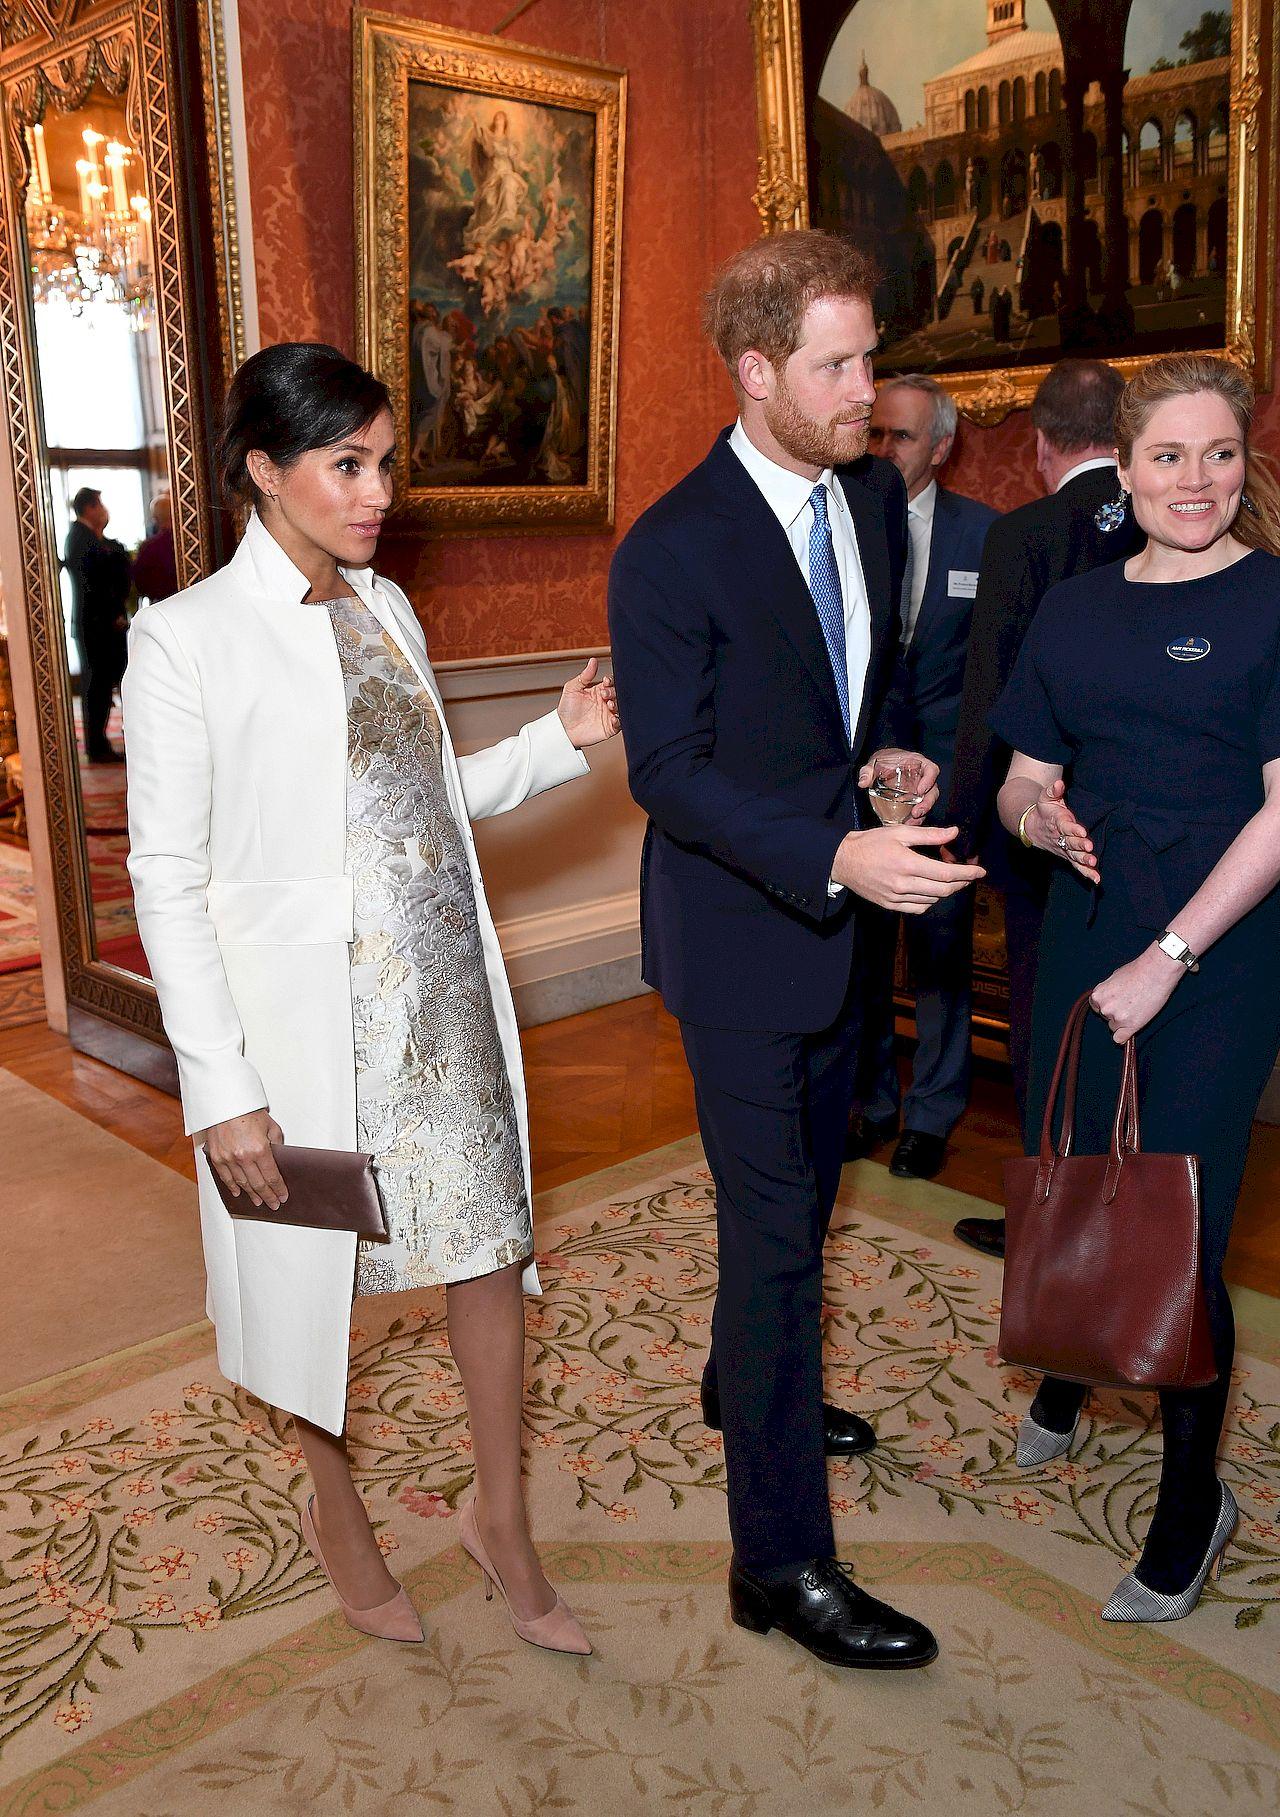 Meghan i Kate na 50-leciu nadania Karolowi tytułu księcia Walii